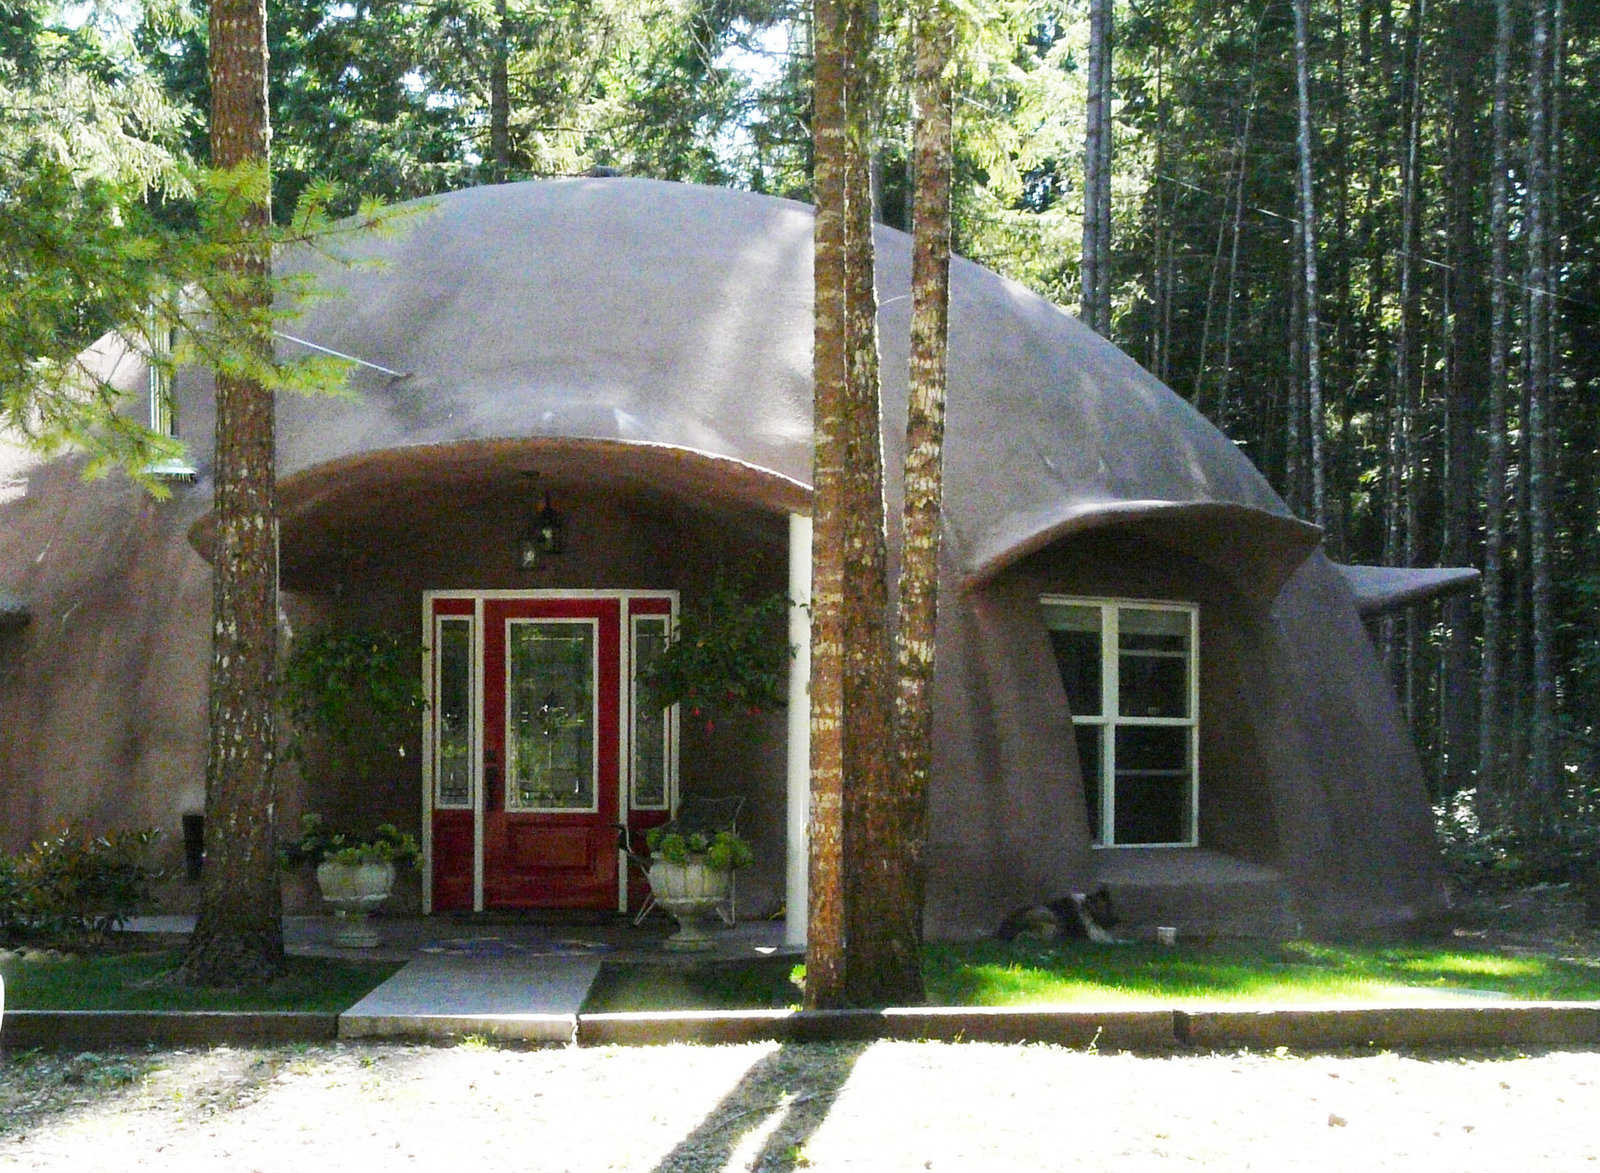 Hendricks Dome Yelm Washington Monolithic Dome Institute